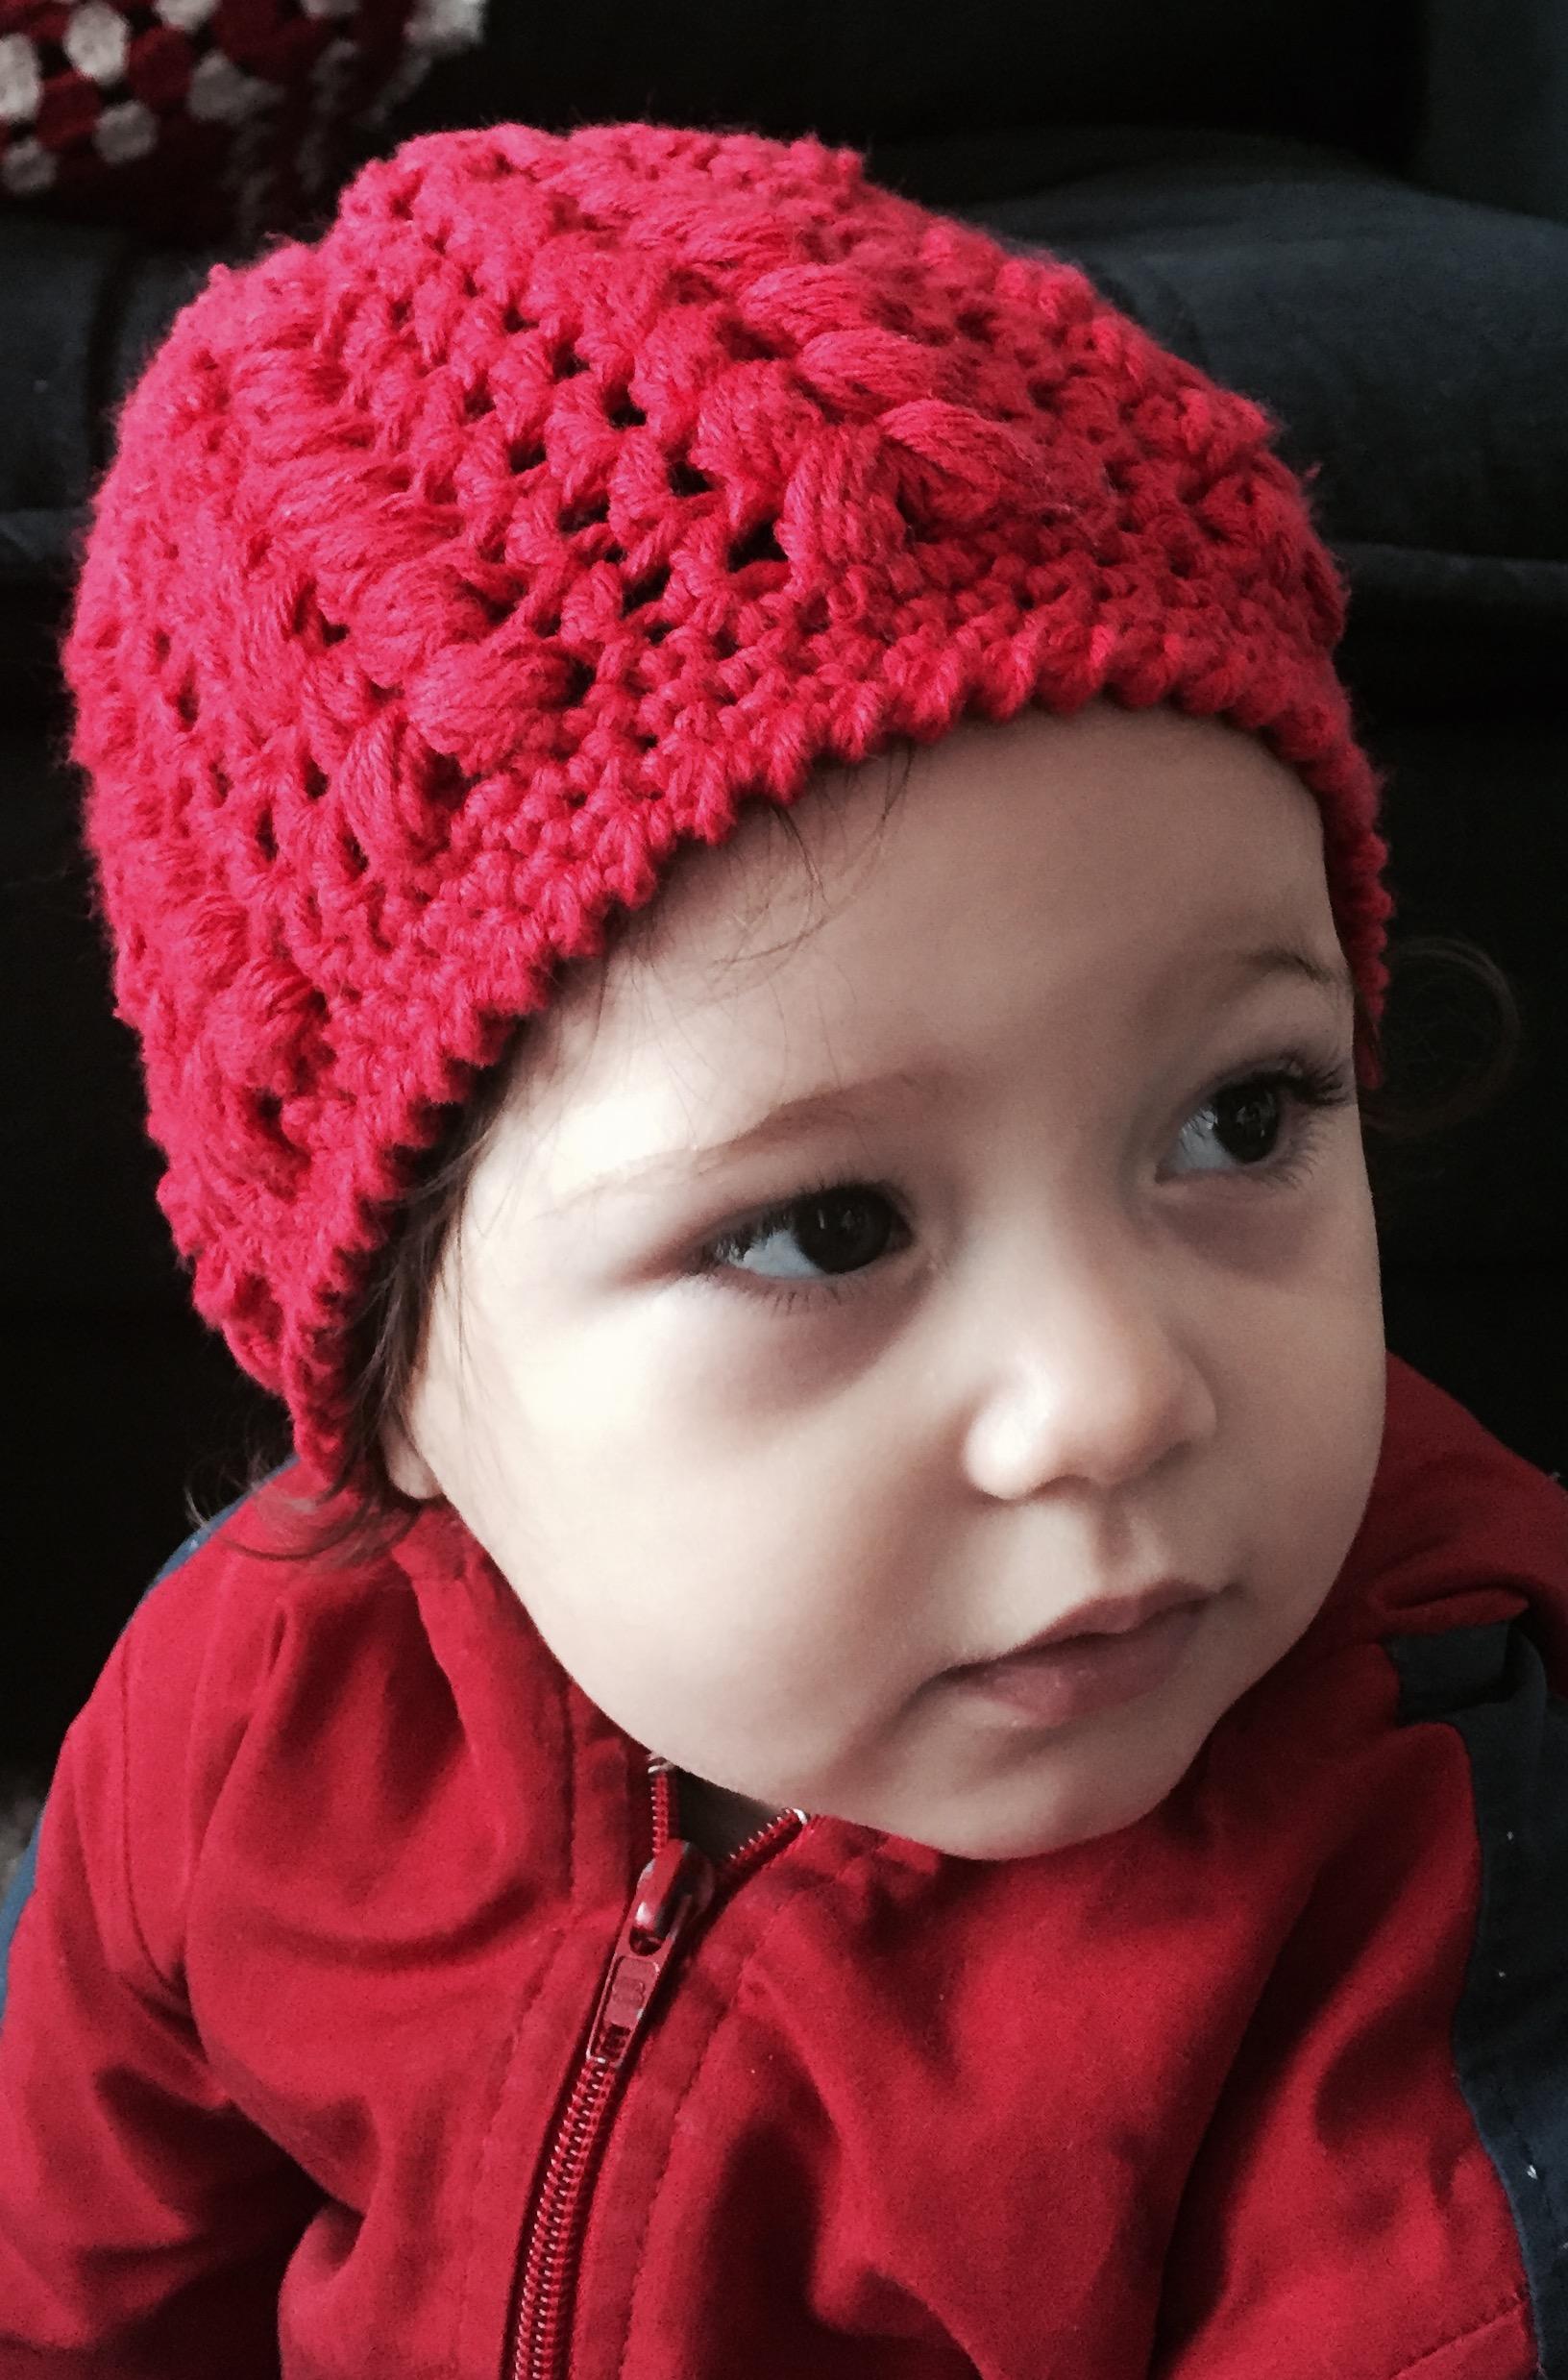 d717f4cc5ee6b Touca Mimo Feminina Infantil no Elo7